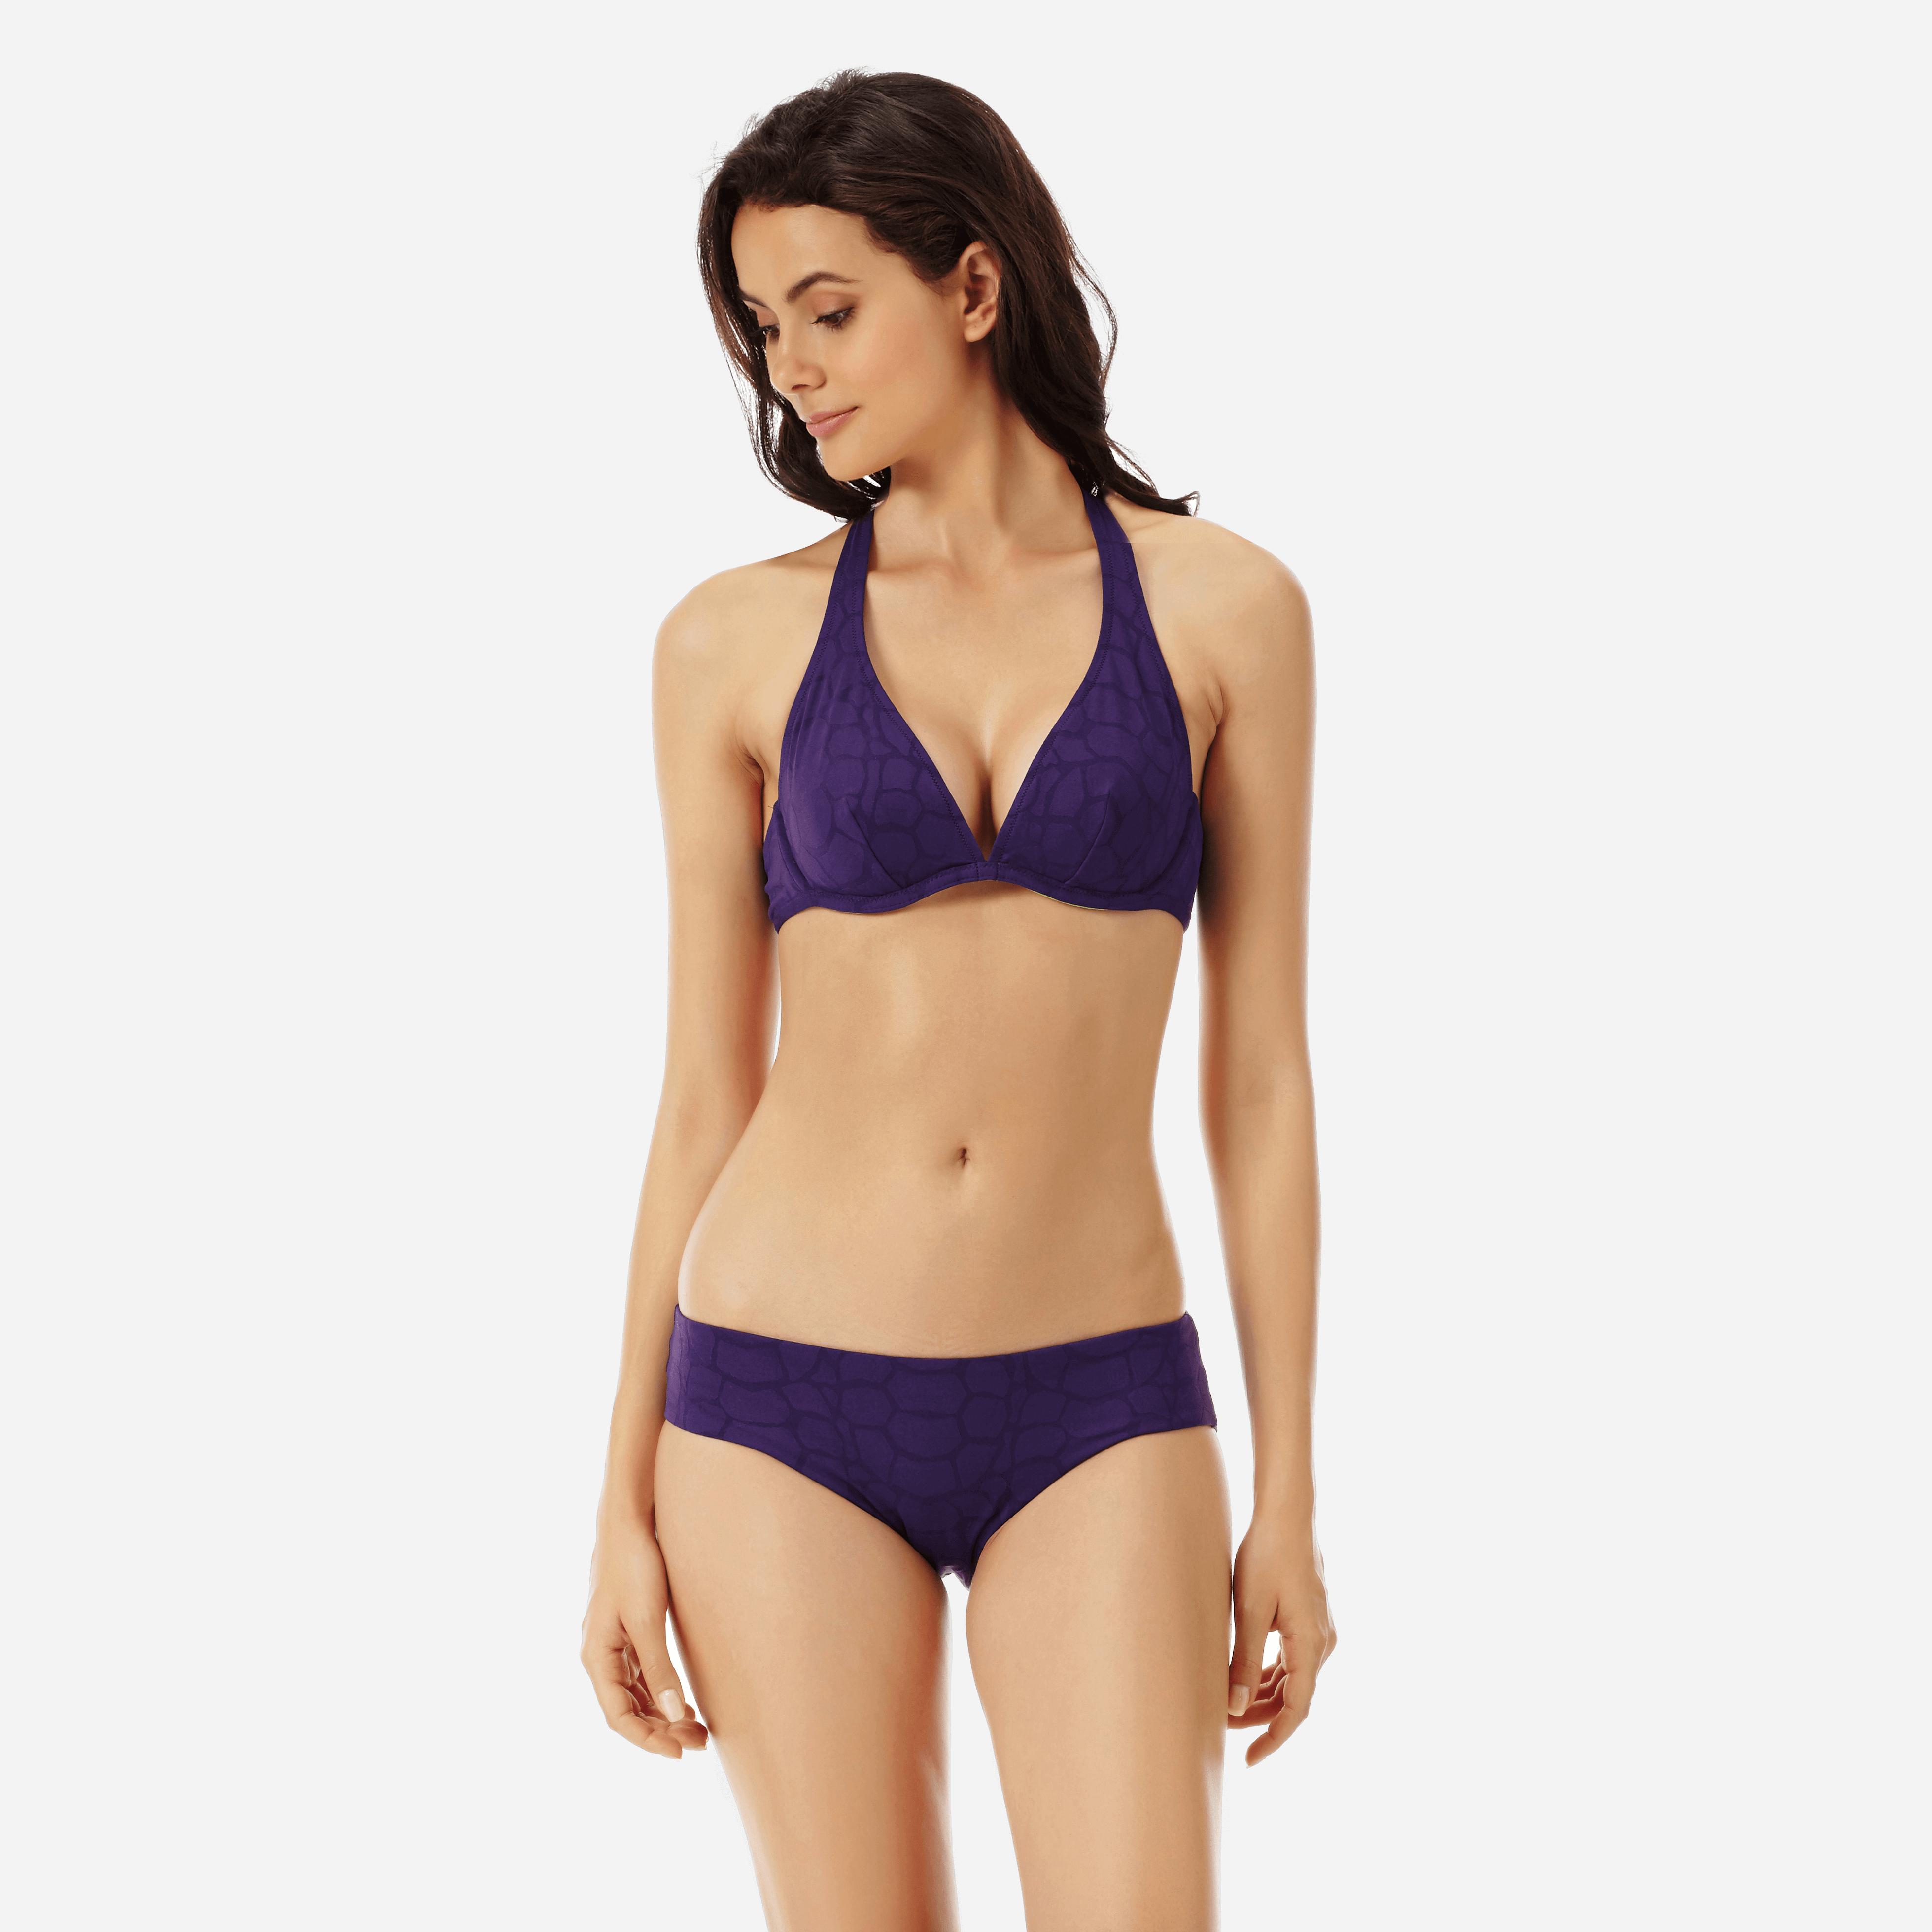 Vilebrequin Women Swimwear - Women Covering Brief Bikini Bottom Ecailles De Tortue - Swimming Trunk - Frisbee In Blue